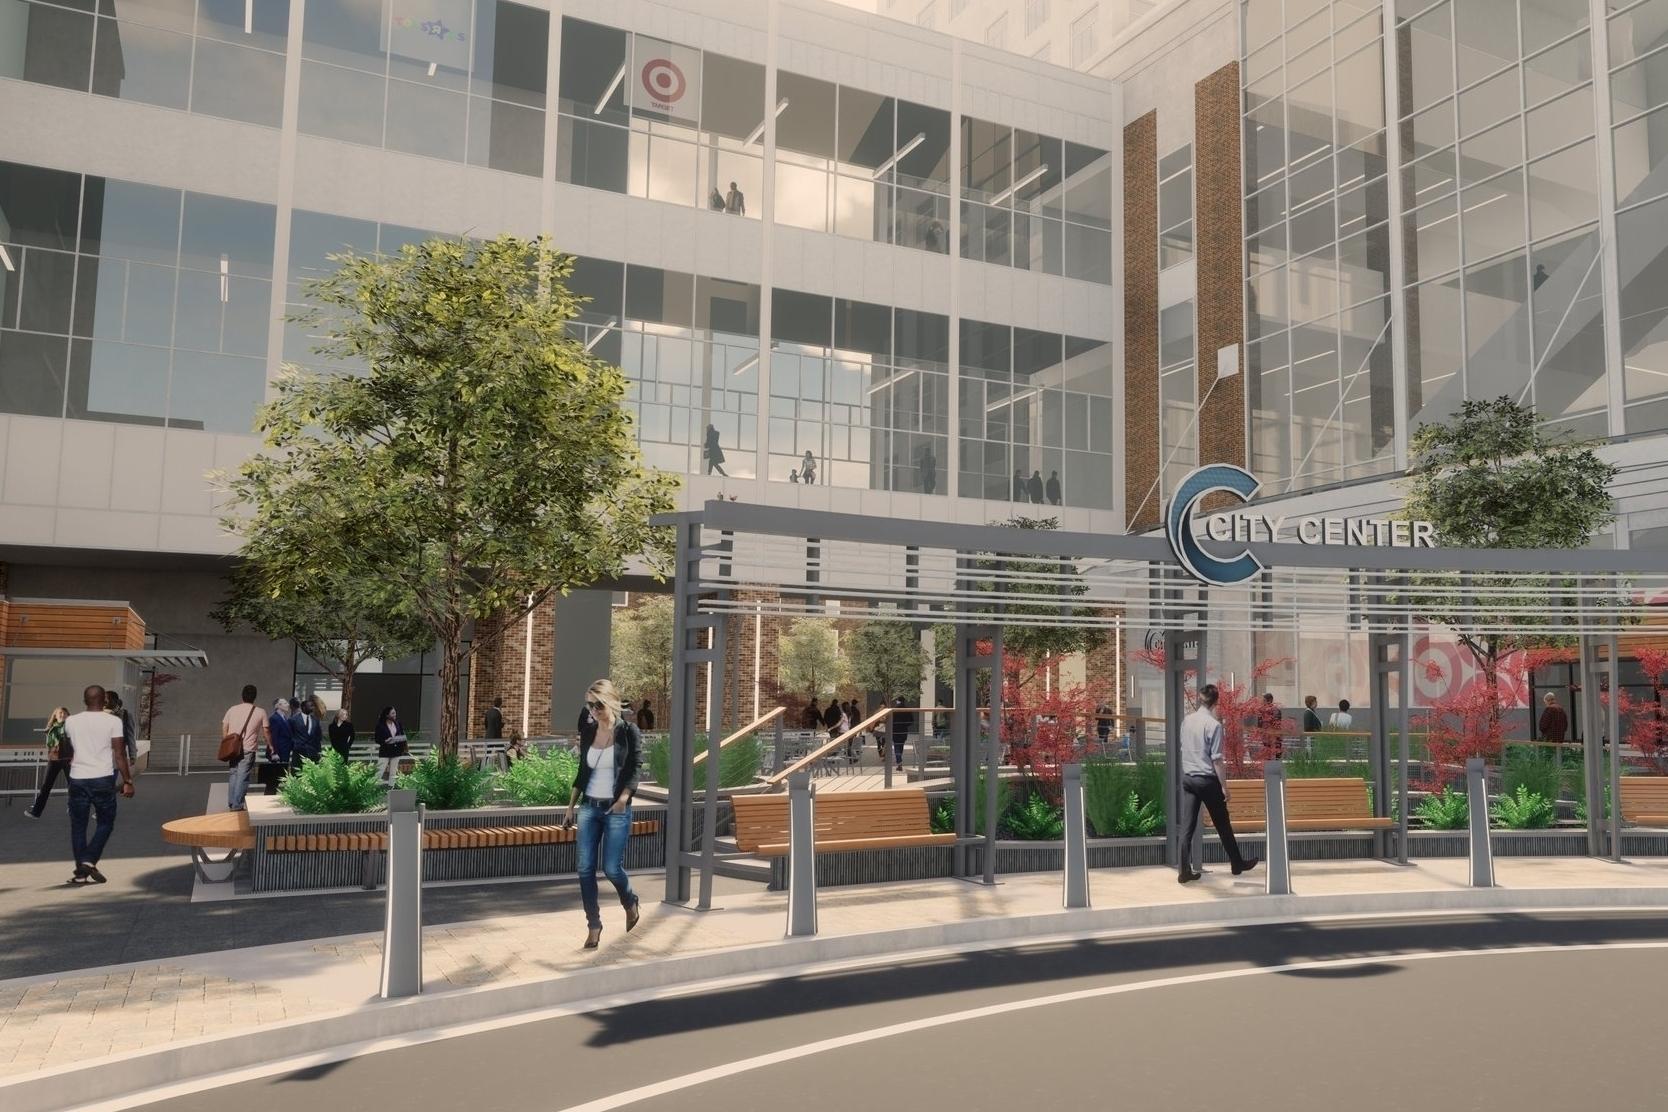 Center City Plaza Renovation and Design